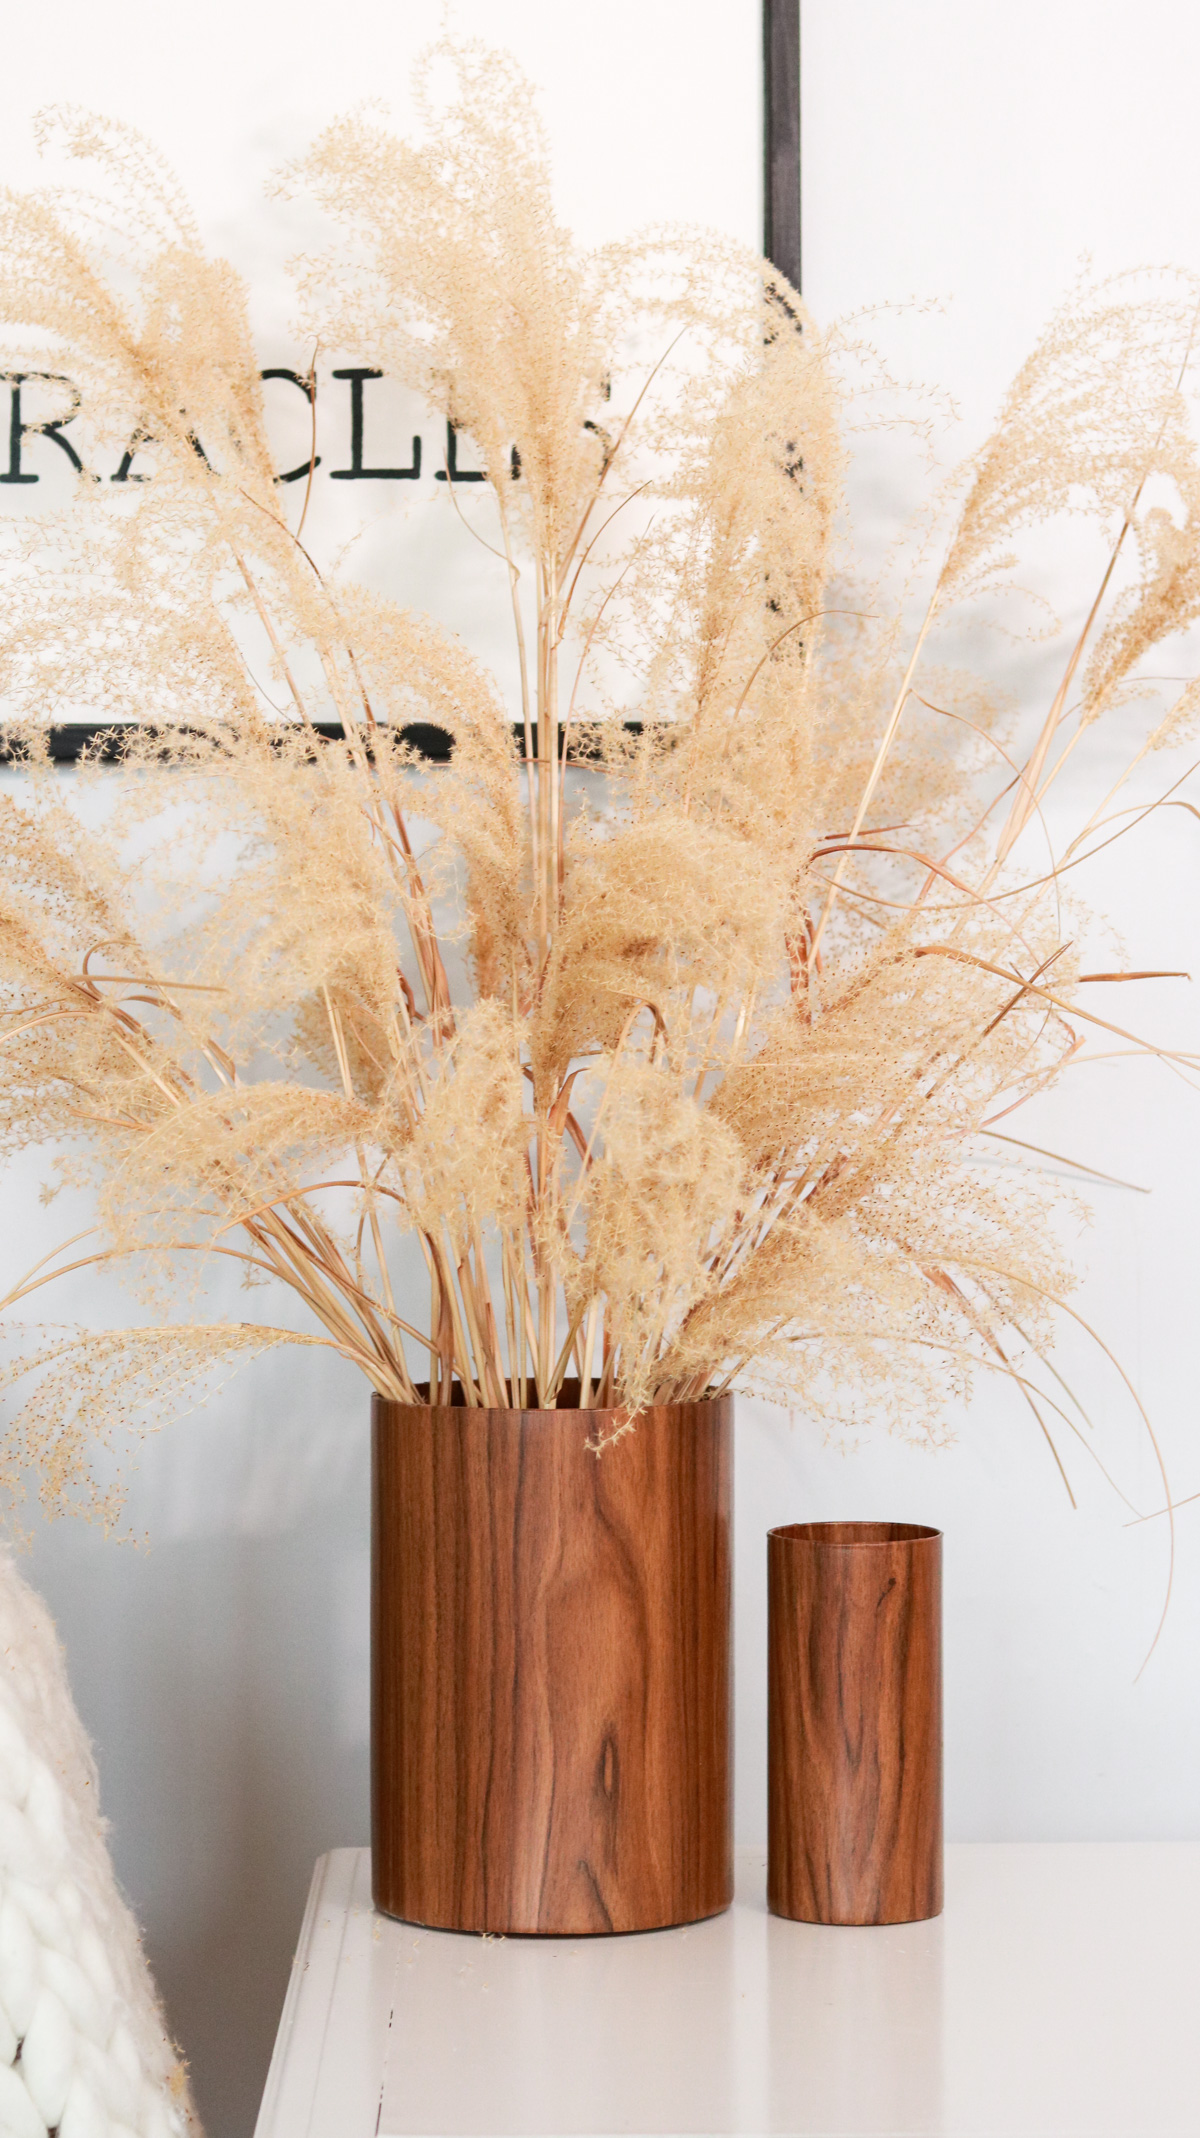 DIY wood vase from glass vases